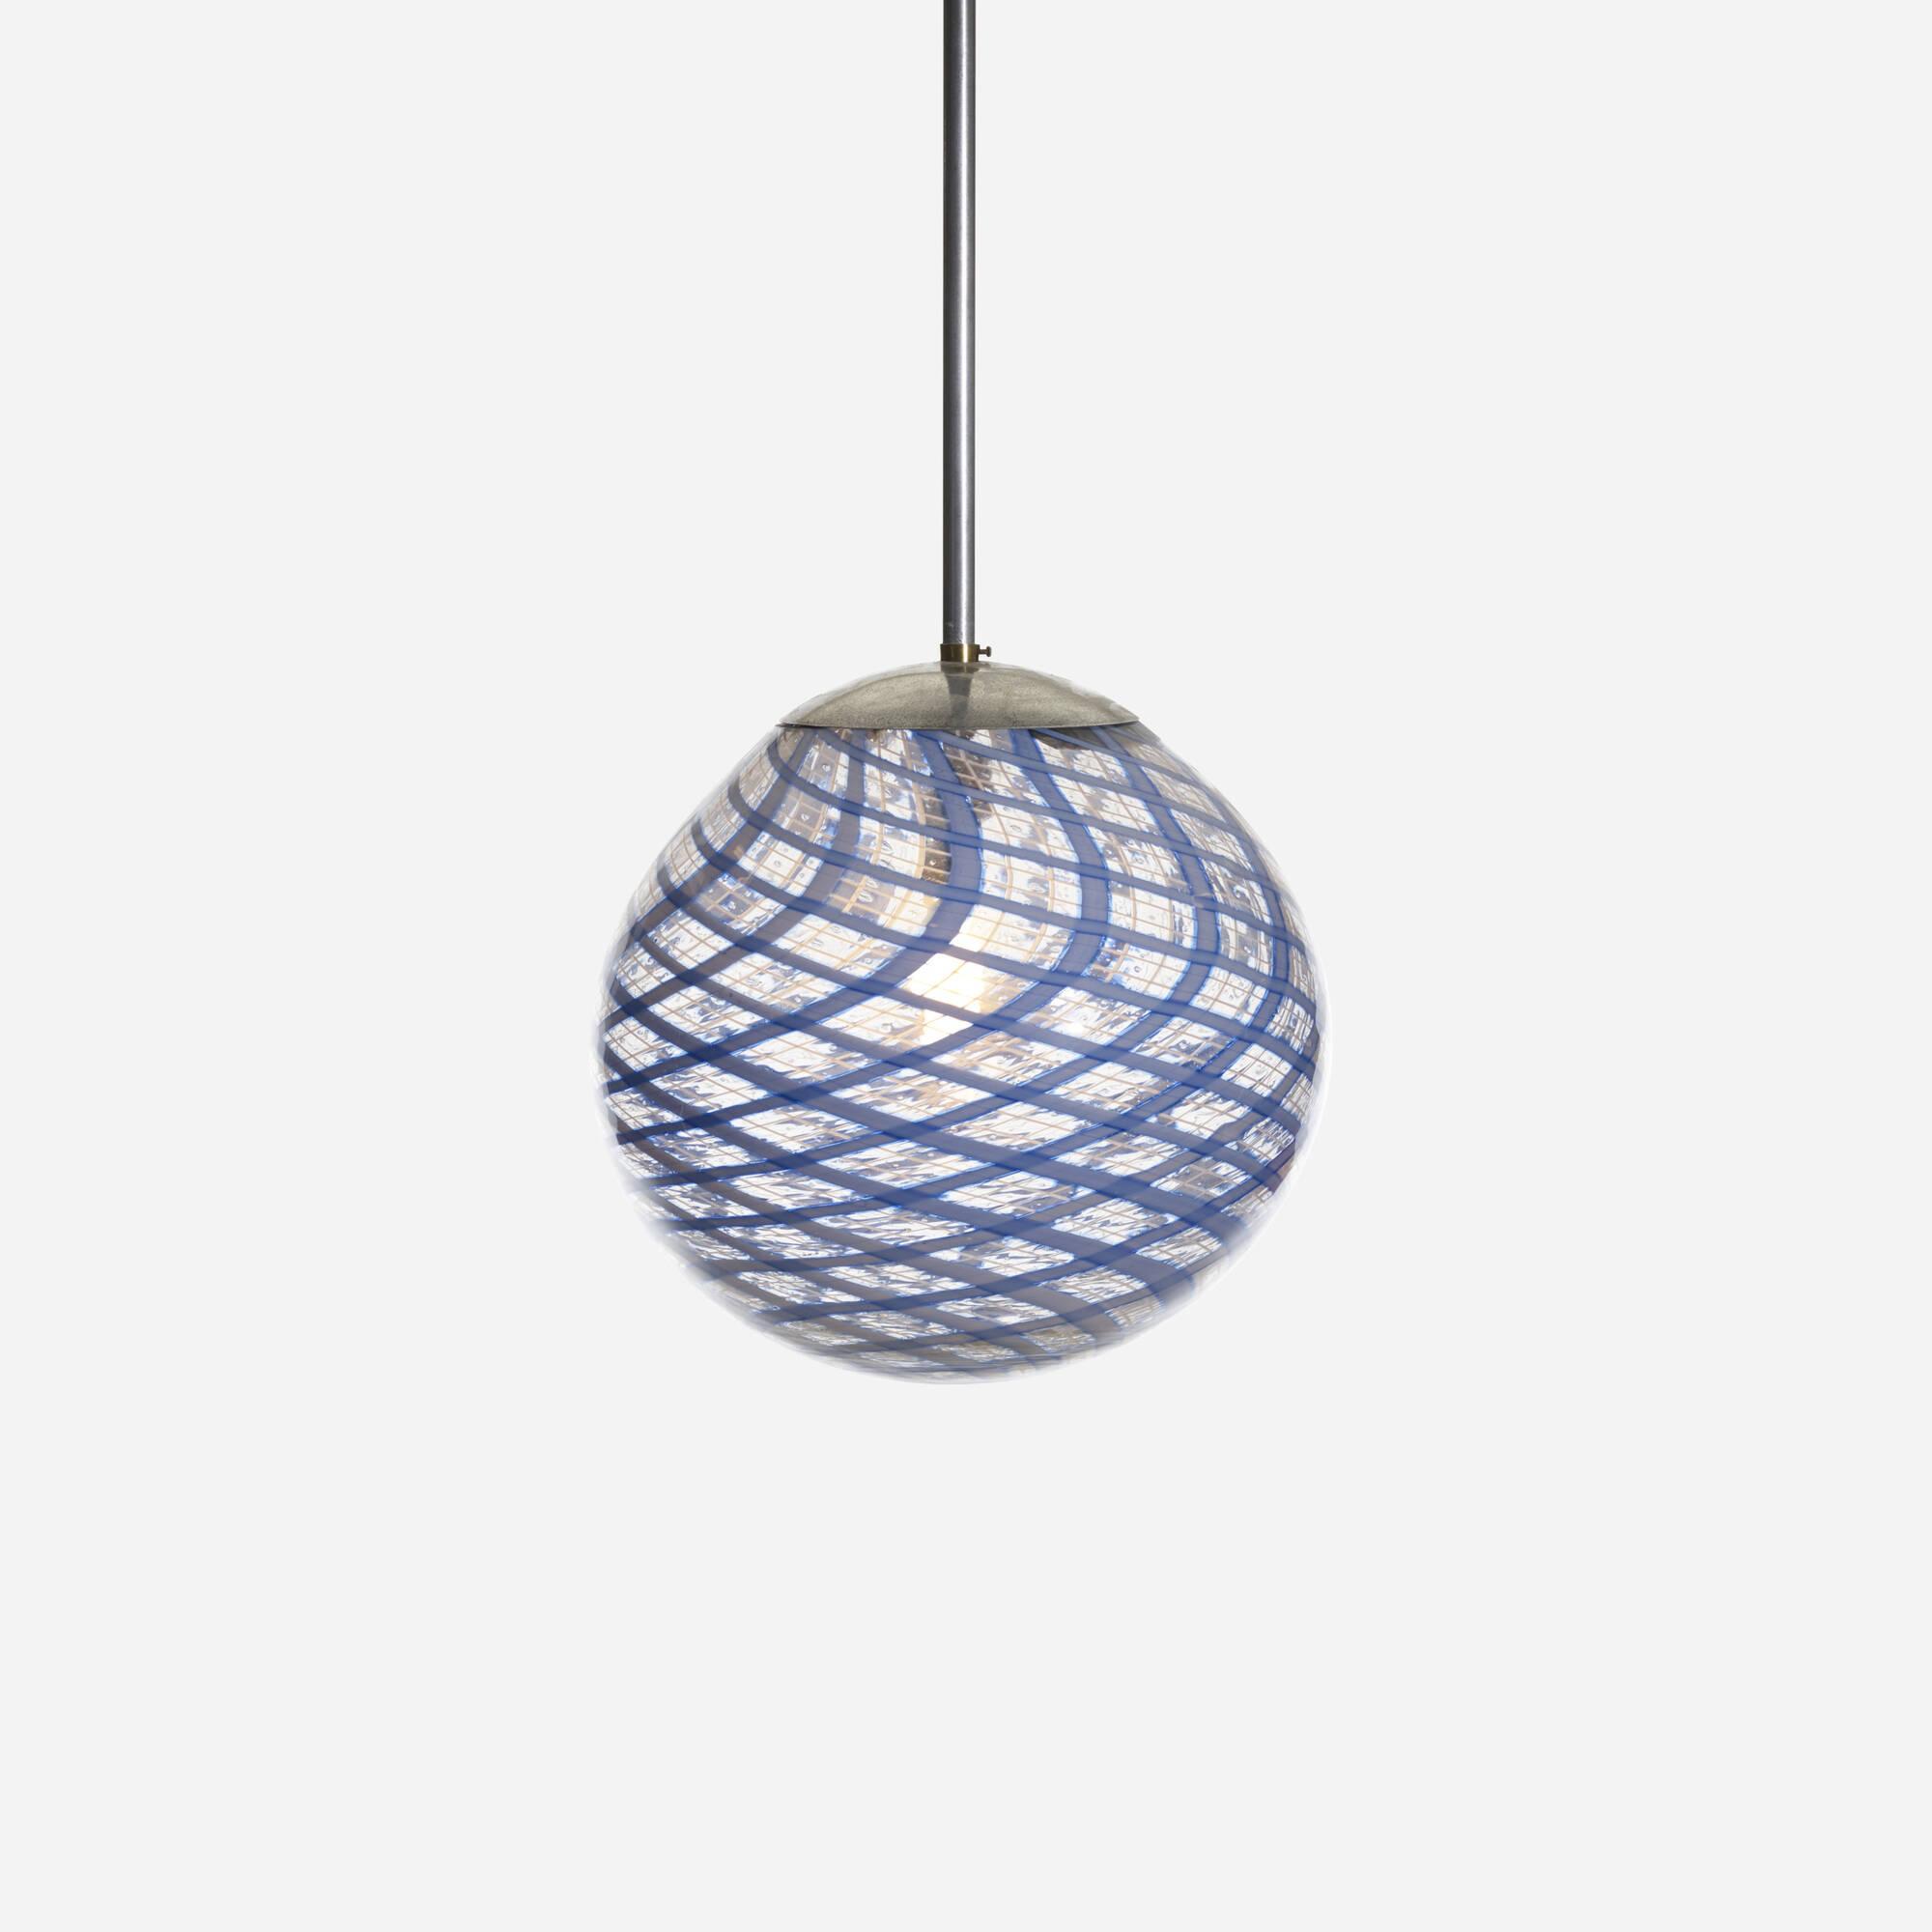 433: Carlo Scarpa, attribution / pendant lamp (1 of 1)